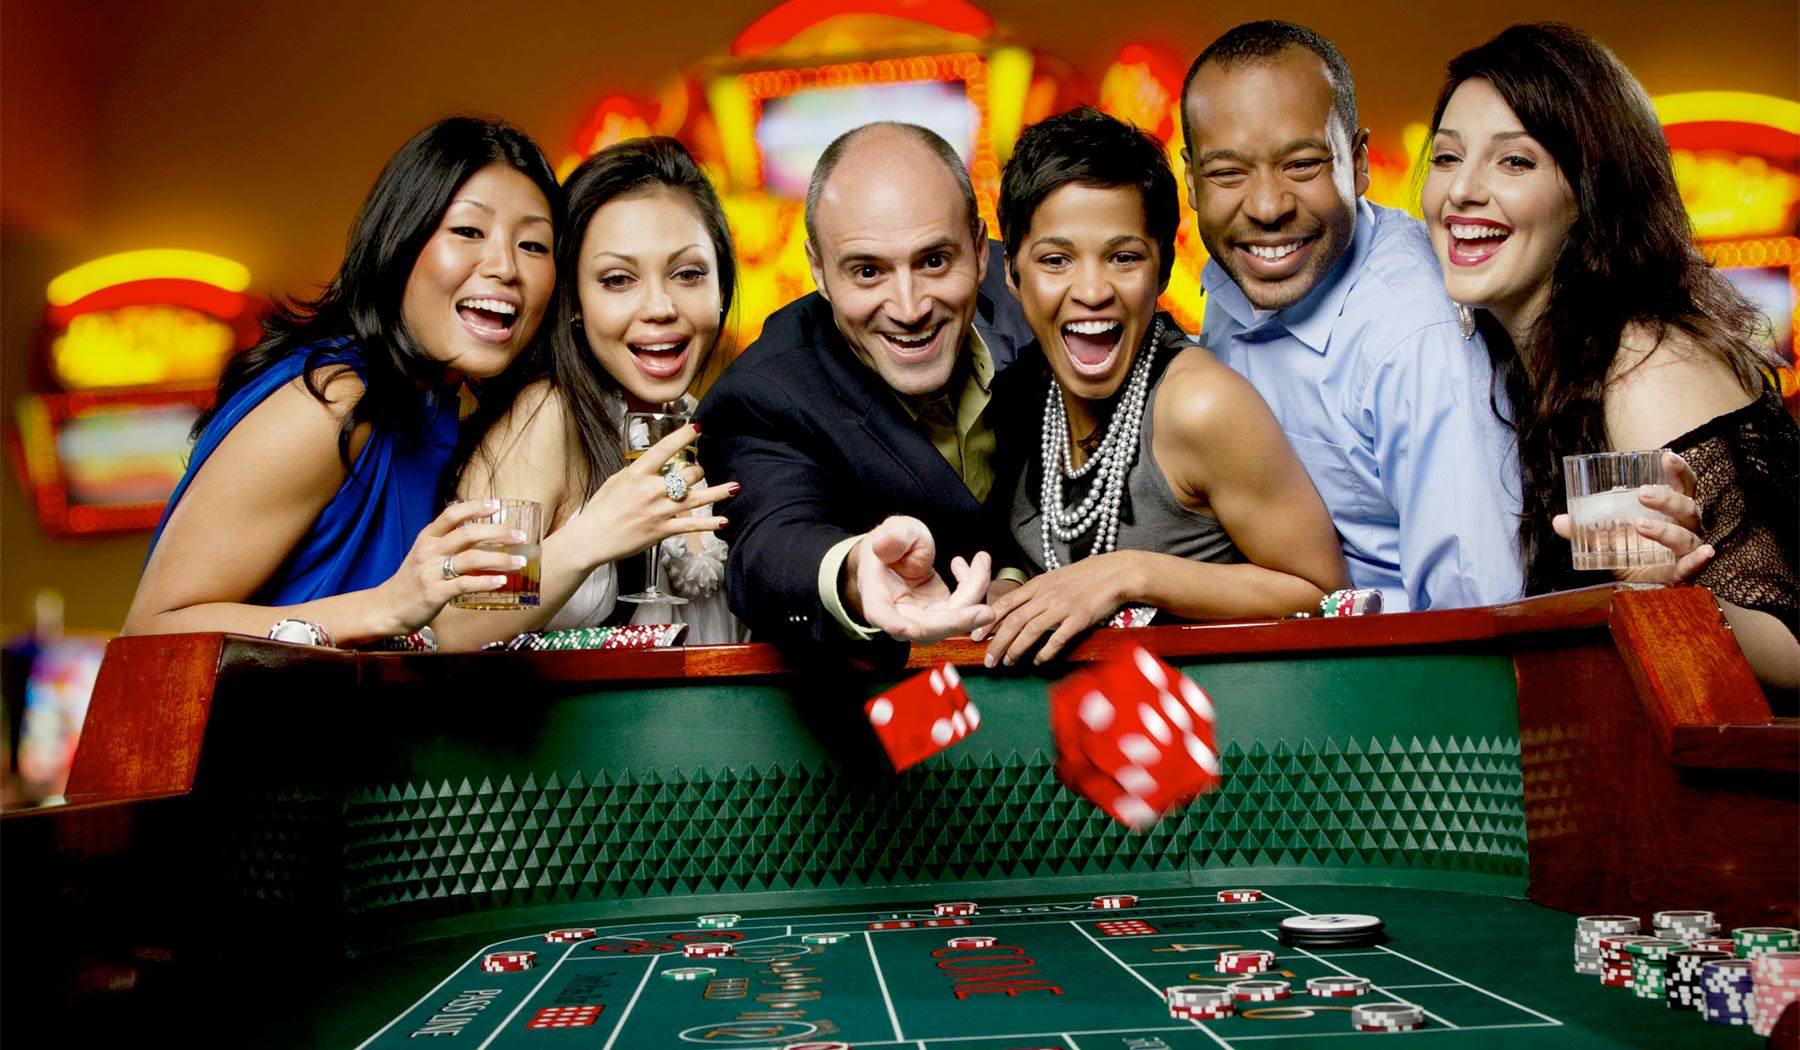 Images of people enjoying gambling at Clearwater Casino